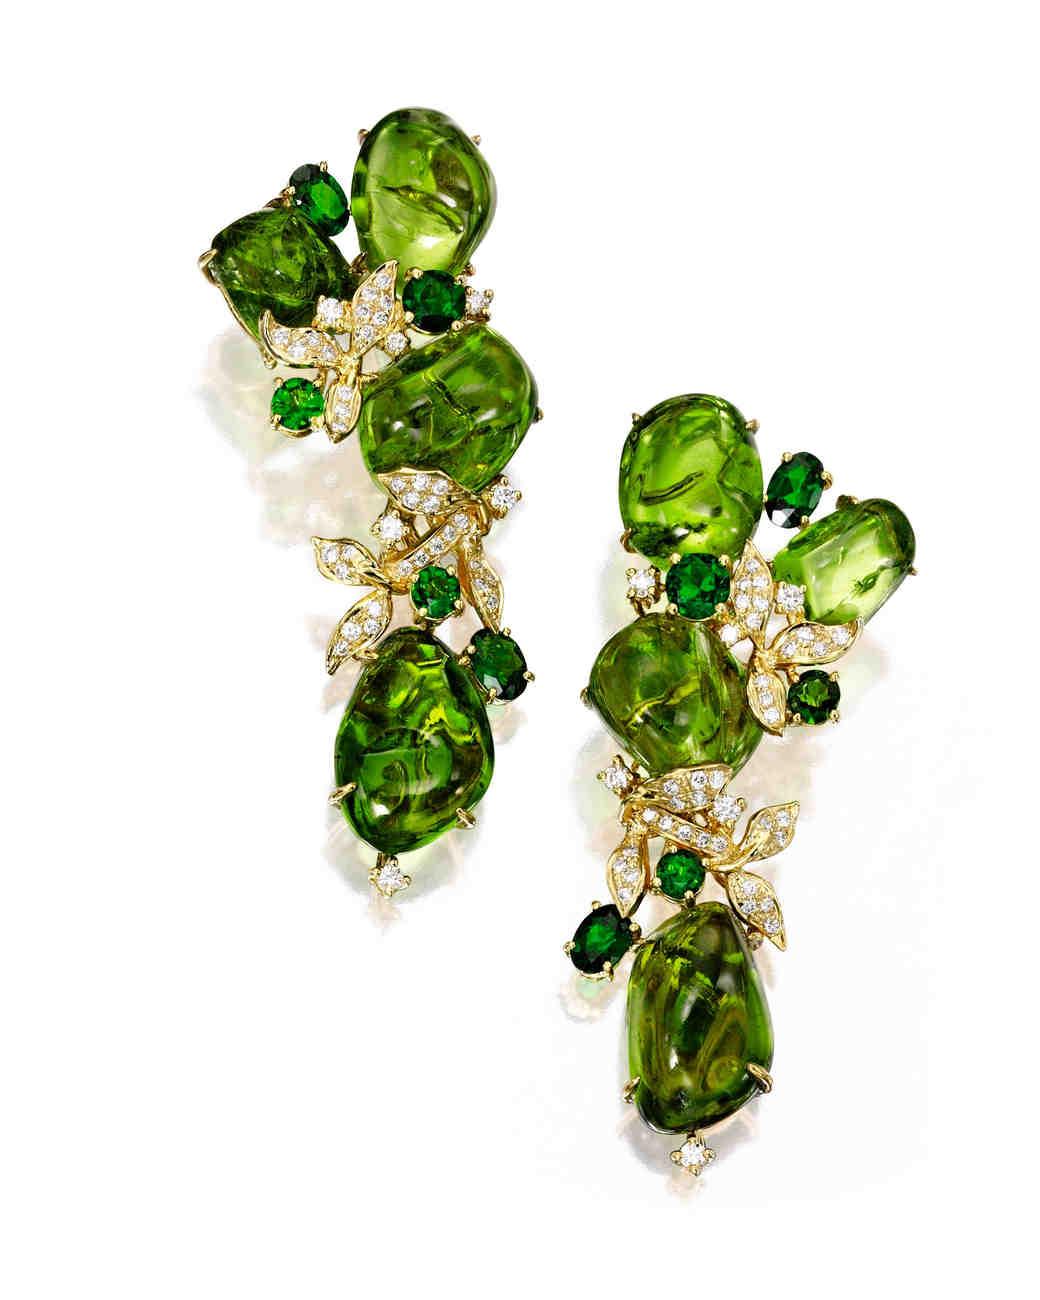 sothebys-ebay-auction-9331-lot-189-0415.jpg